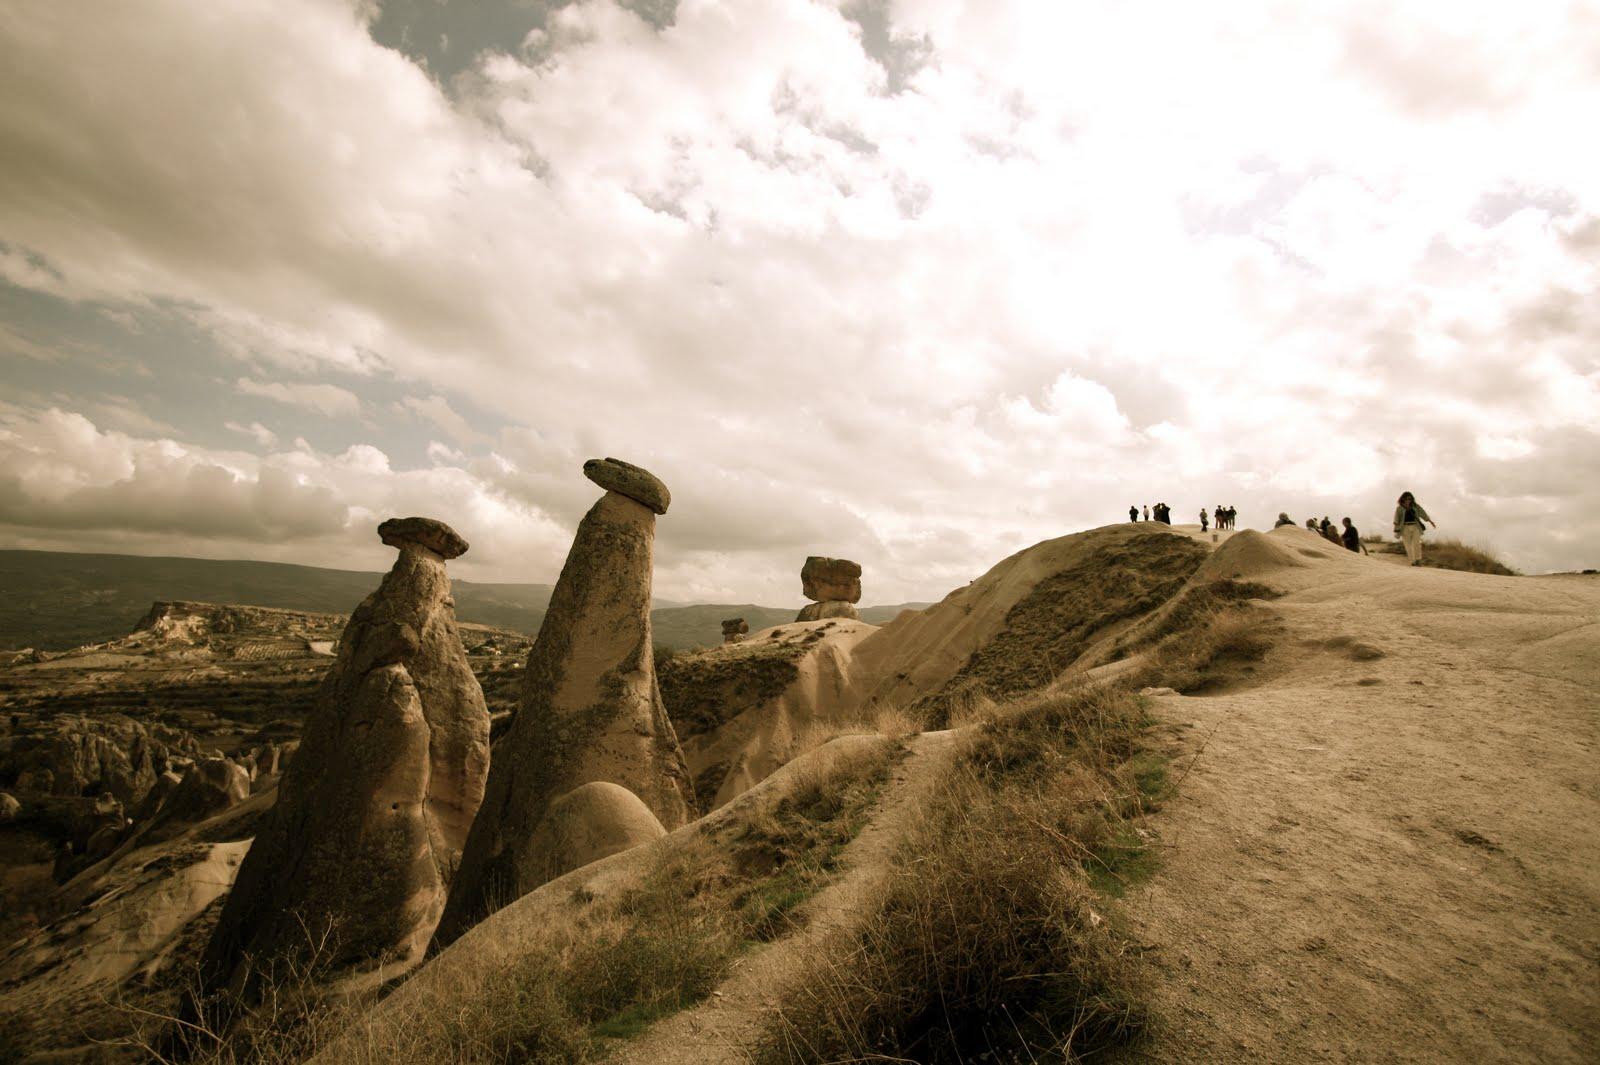 Sasaya Cappadocia Real Life Bedrock